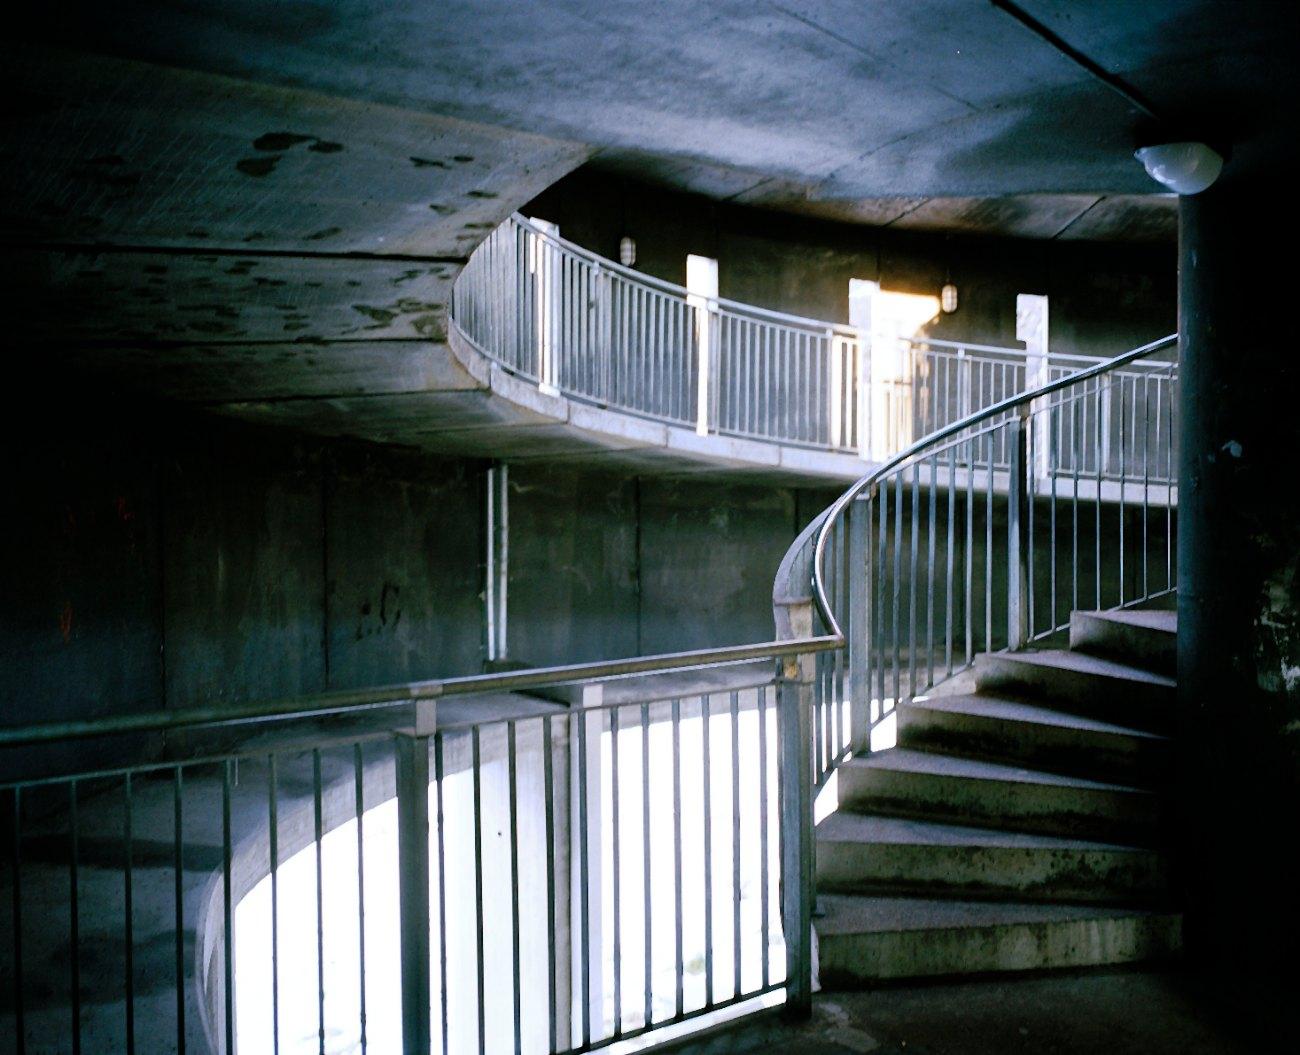 stairs I, 2009, C-print, 83 x 101 cm